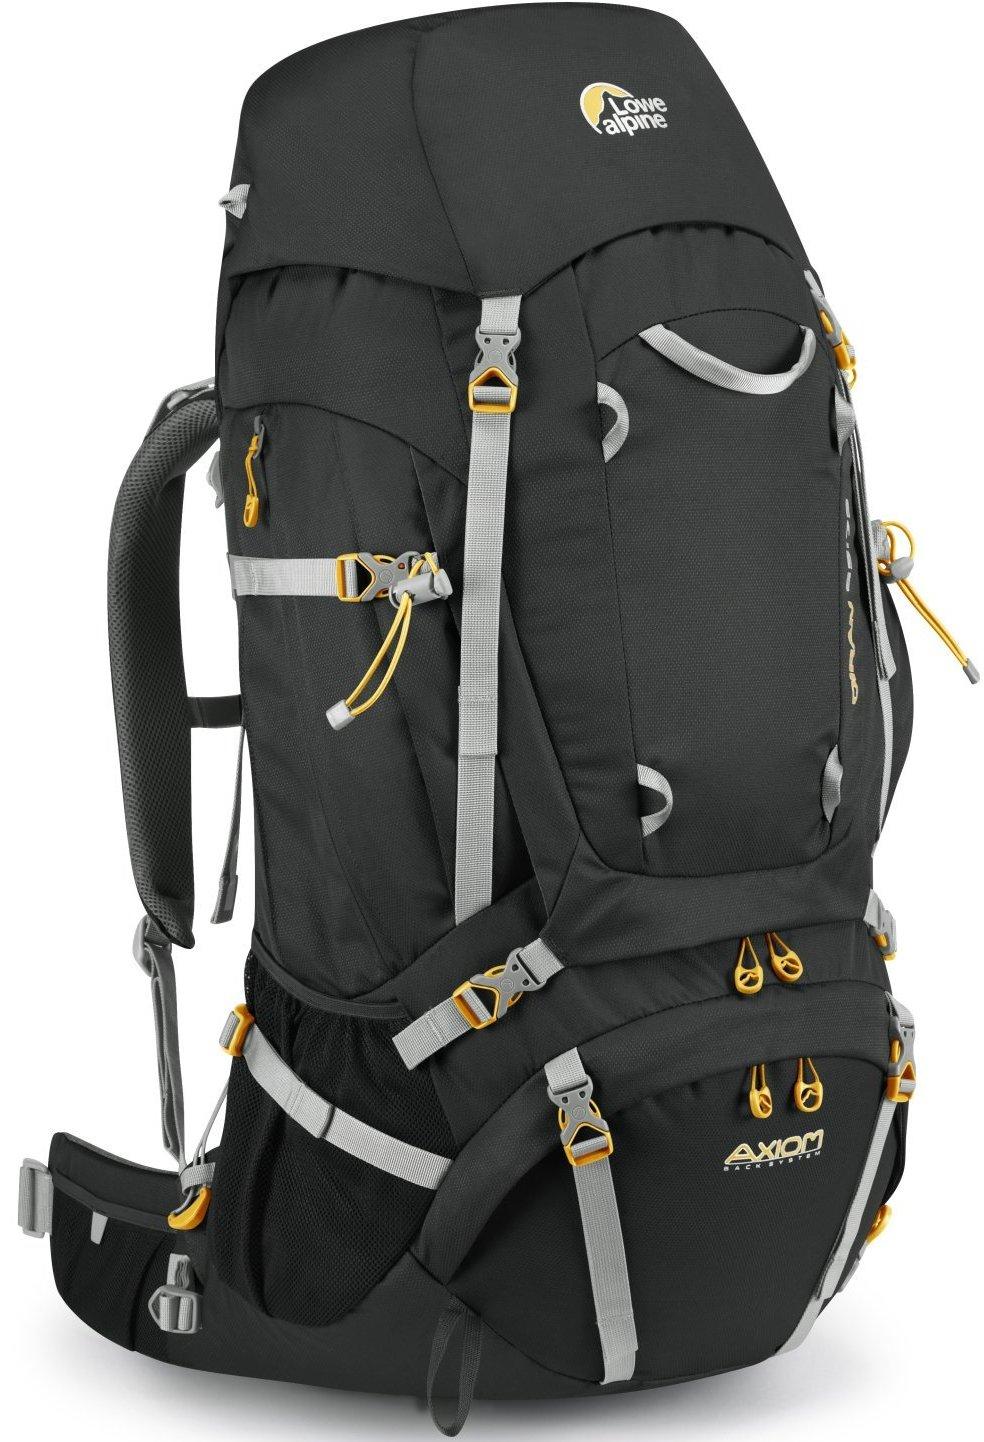 Lowe Alpine 後背包/背包客/健行/登山背包 Diran 65-75 登山包/大背Axiom FMP93-AN煤炭黑